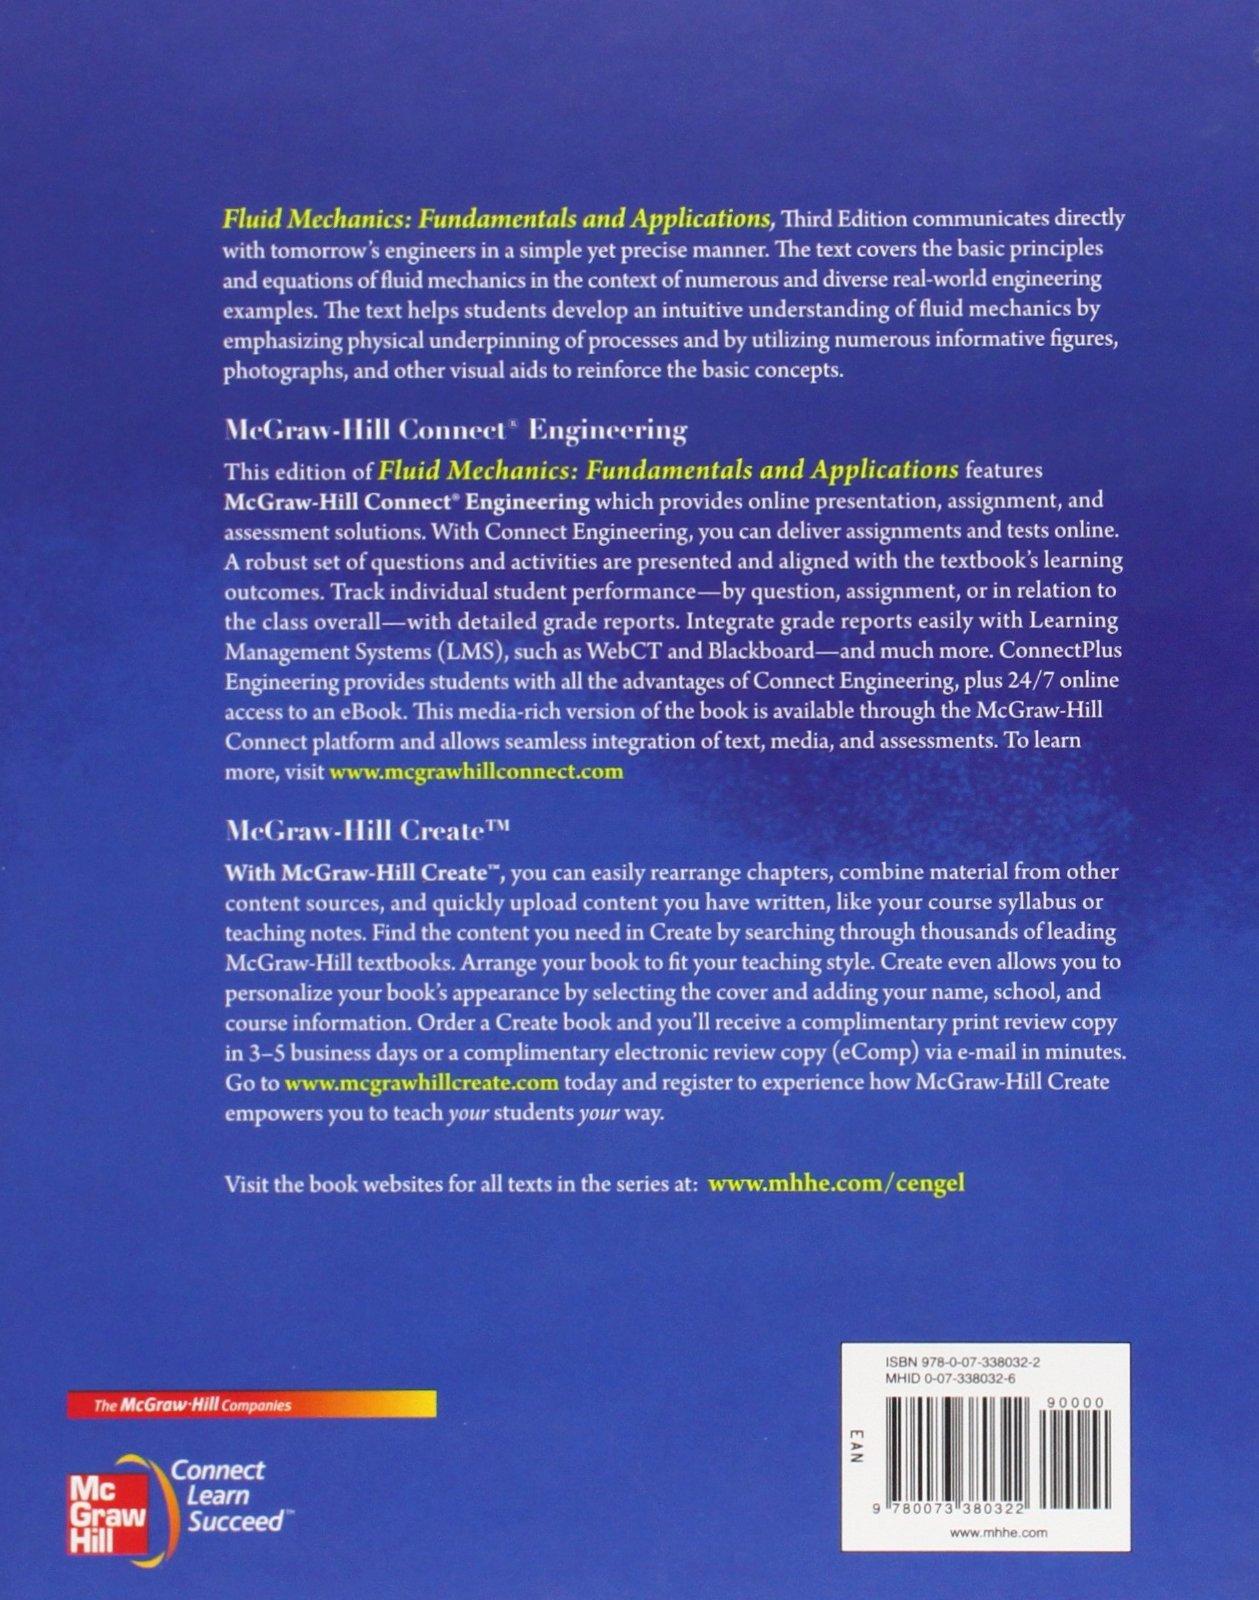 fluid mechanics mcgraw hill pdf